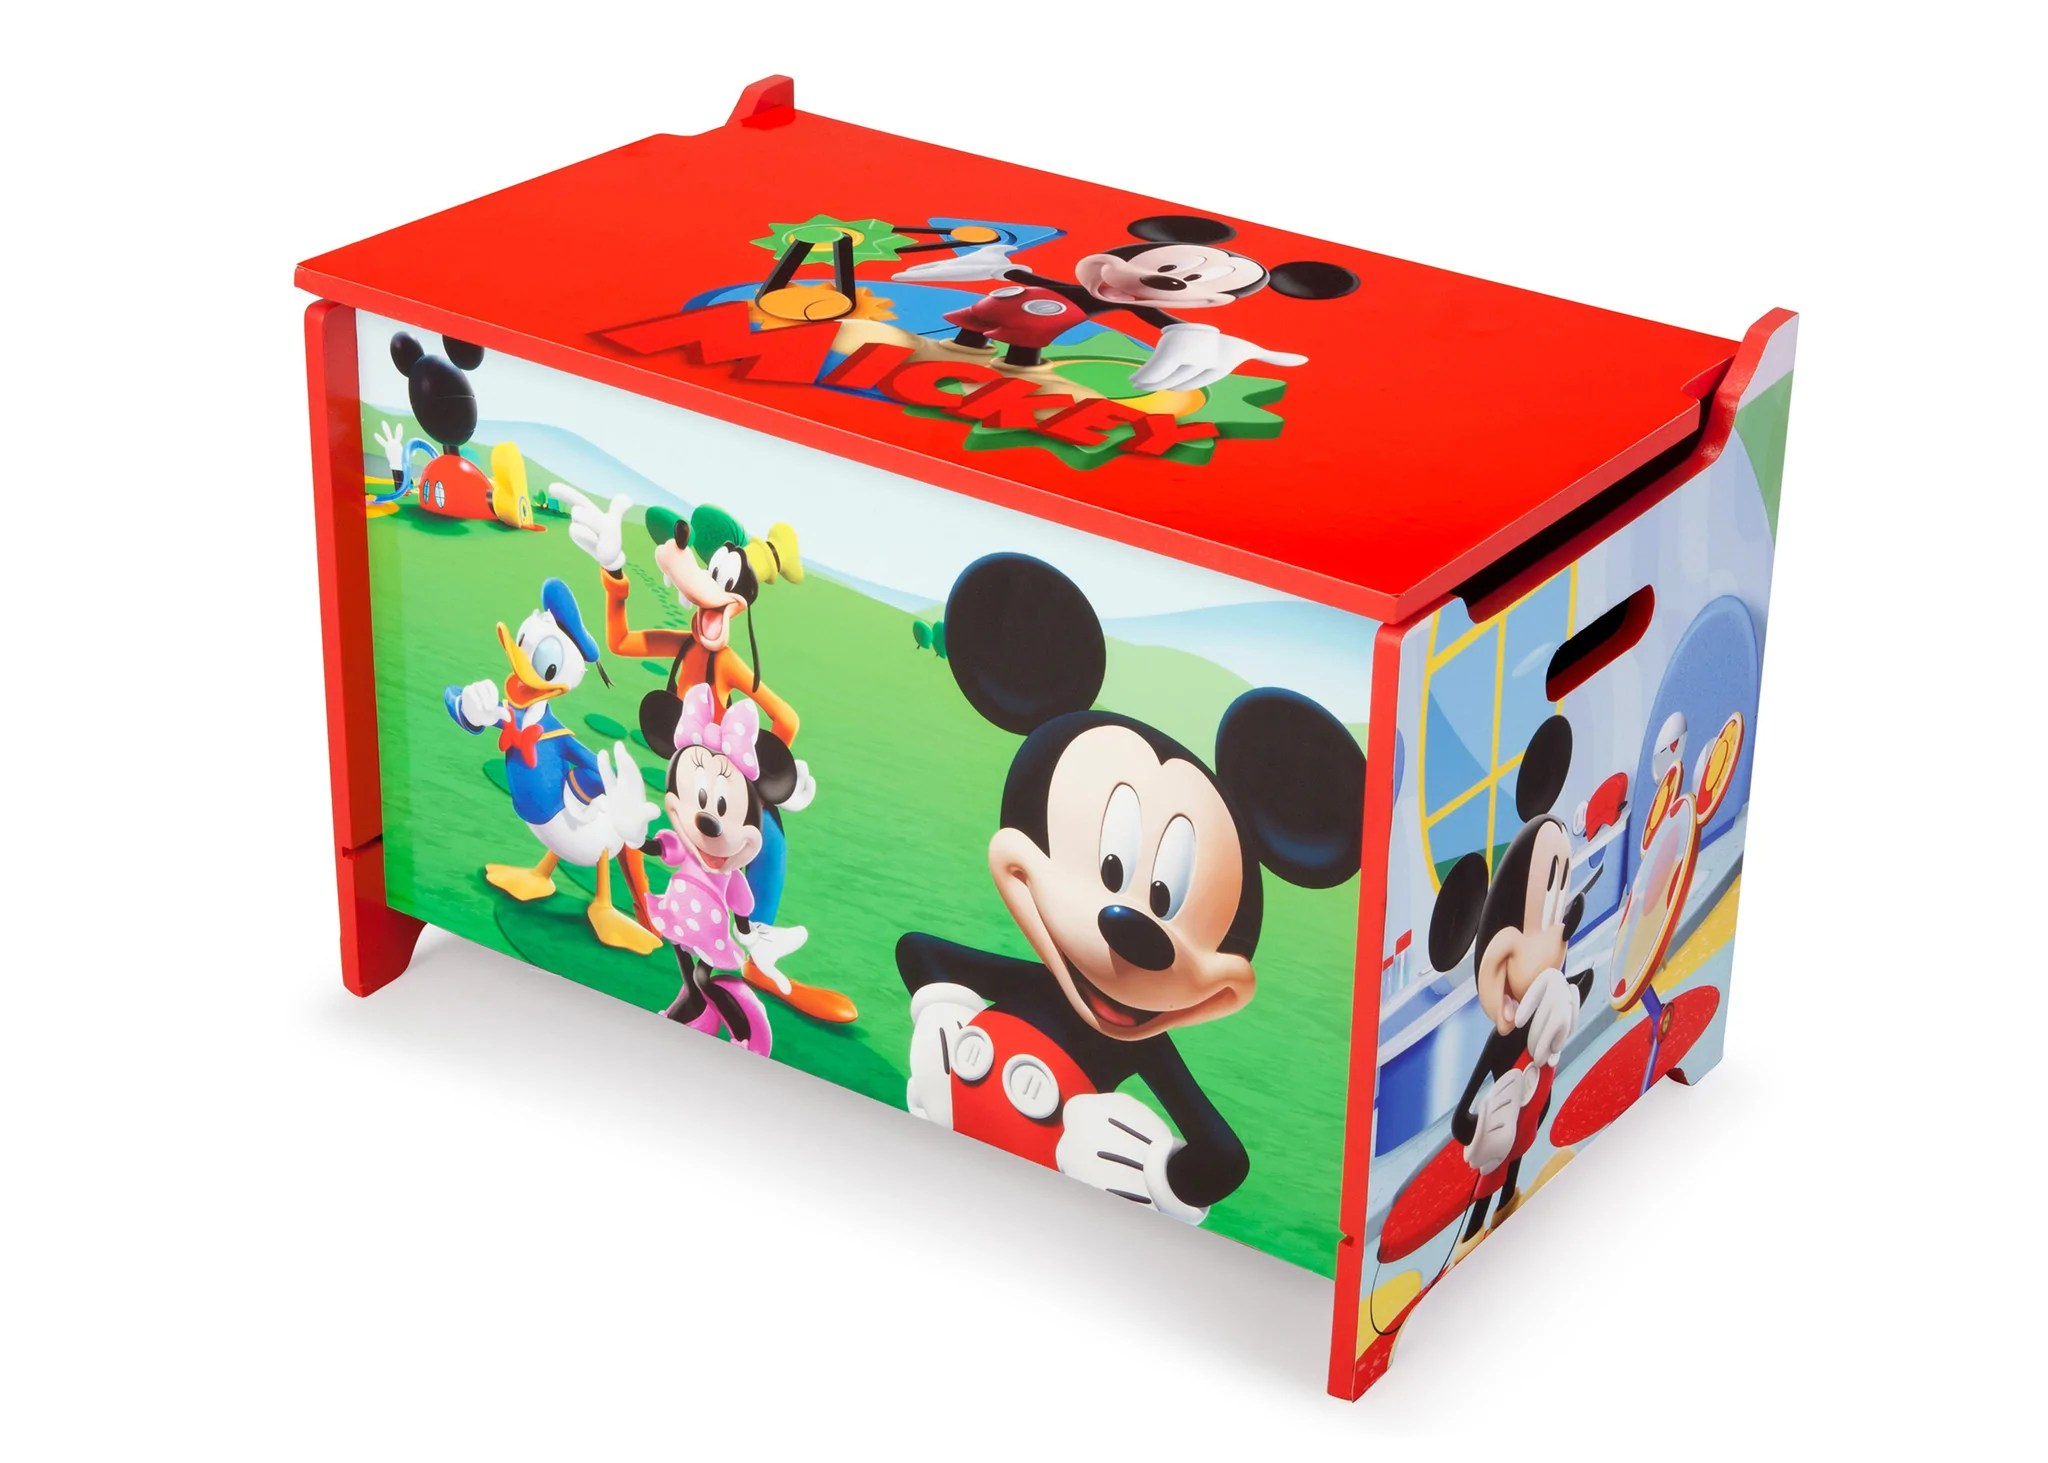 Mickey Mouse Wooden Toy Box Delta Children Eu Pim